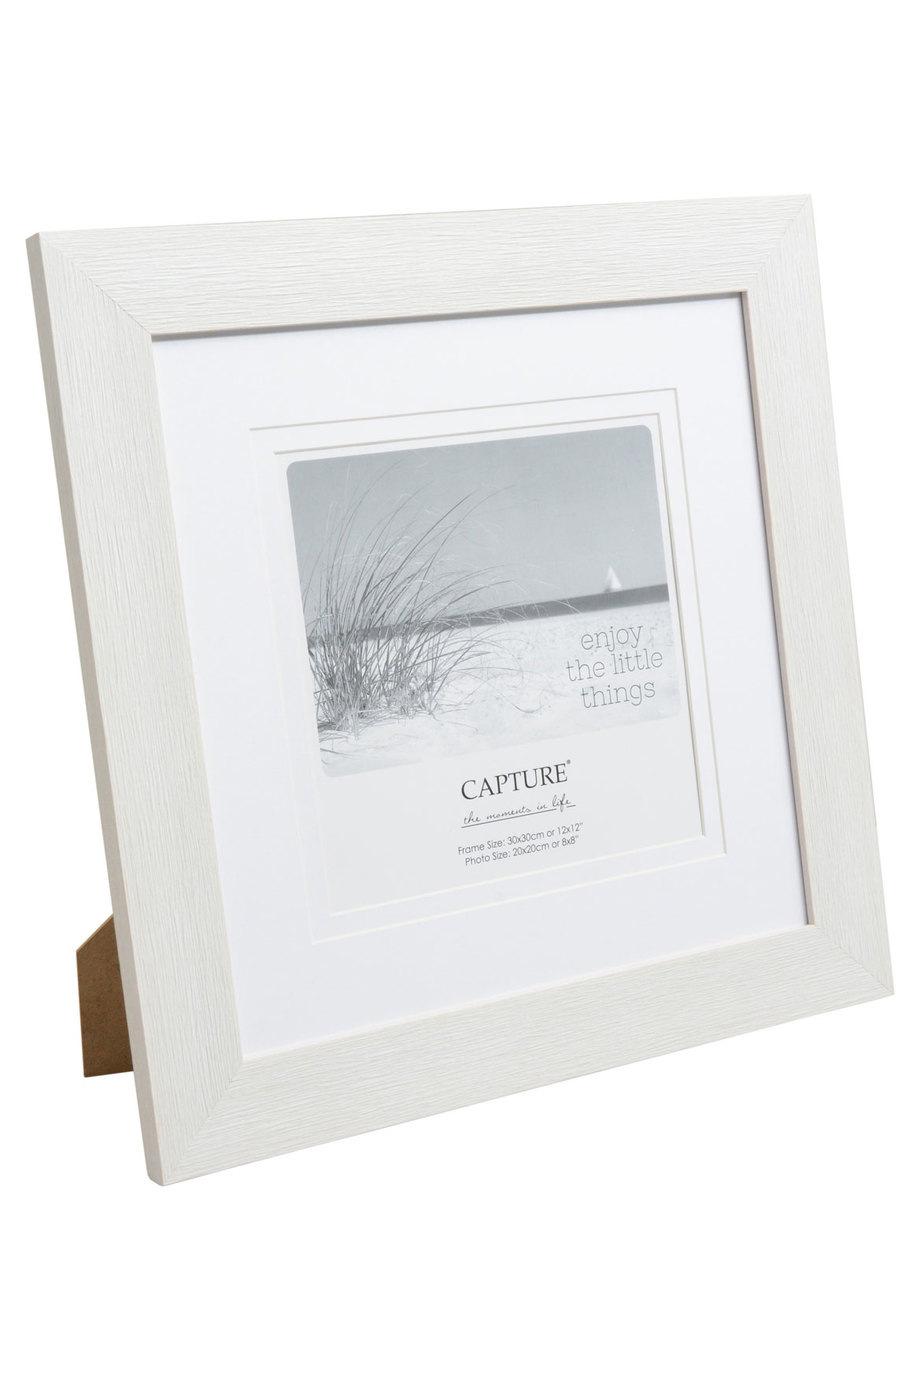 Capture | Caymen 20x20cm White Photo Frame | Myer Online